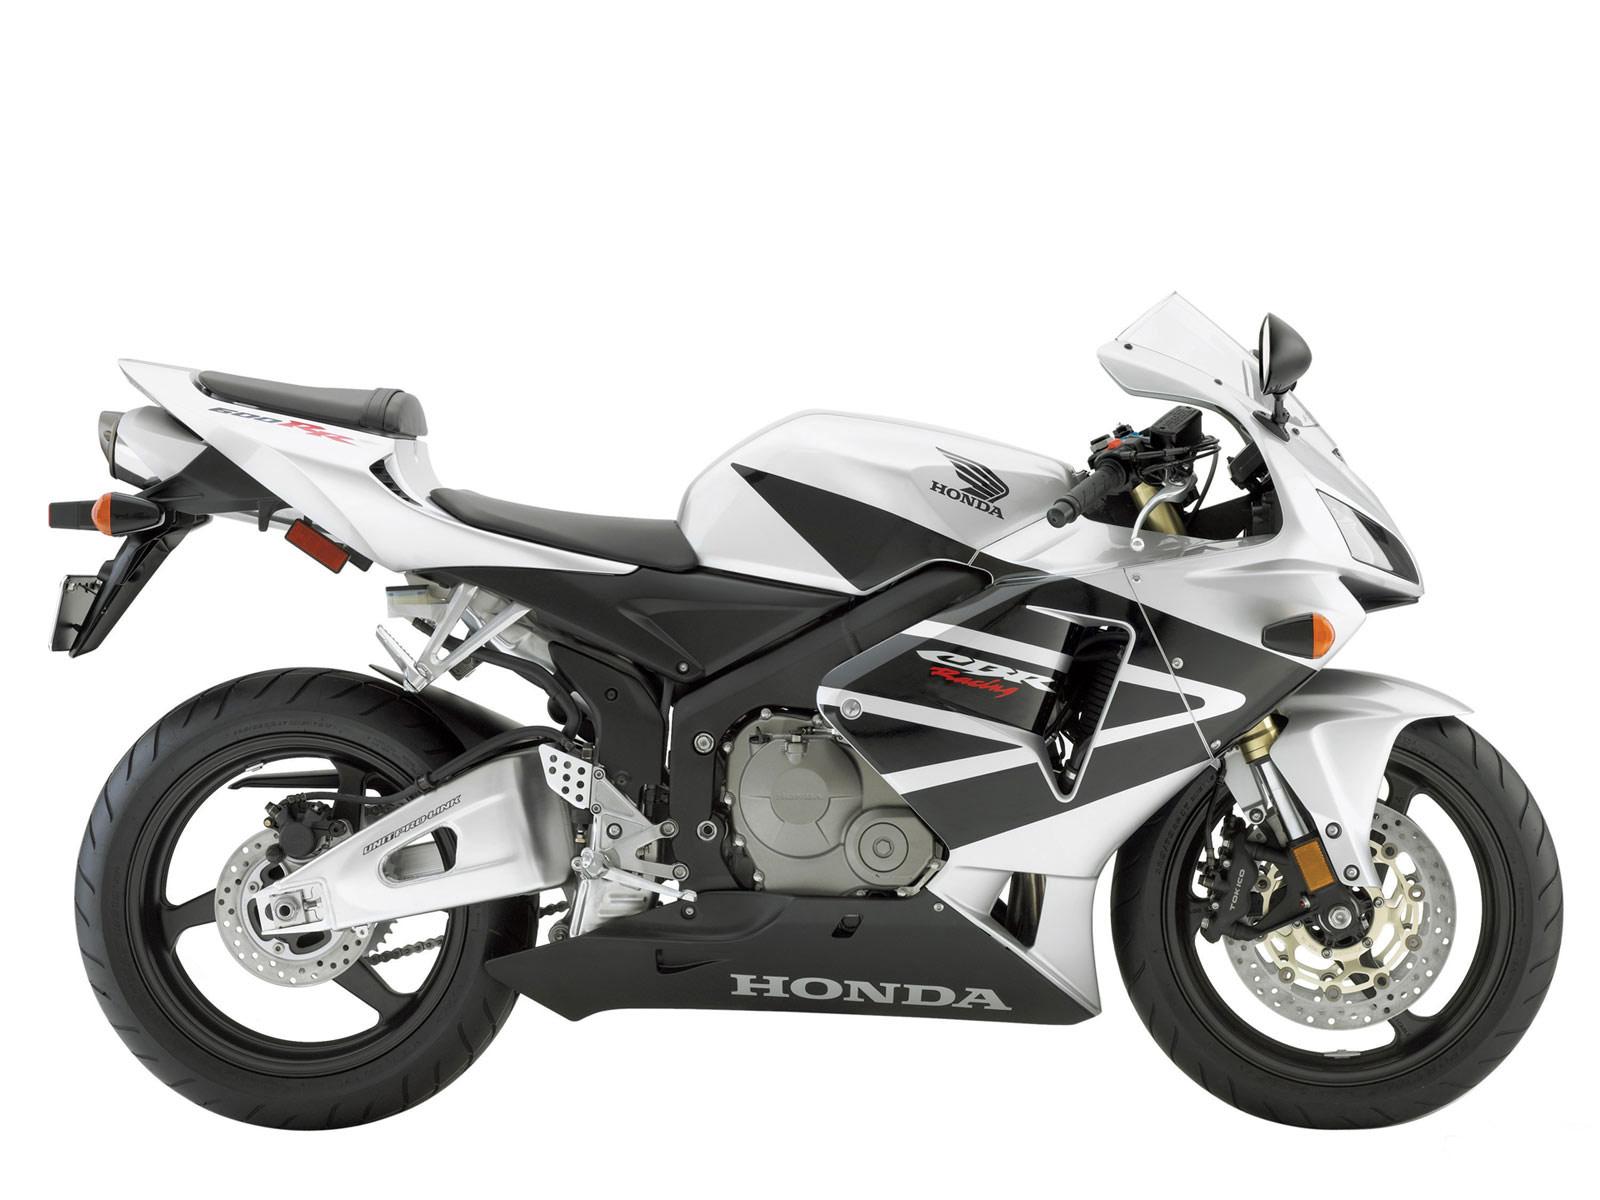 2005 Honda CBR 600 RR pic 20 - onlymotorbikes.com